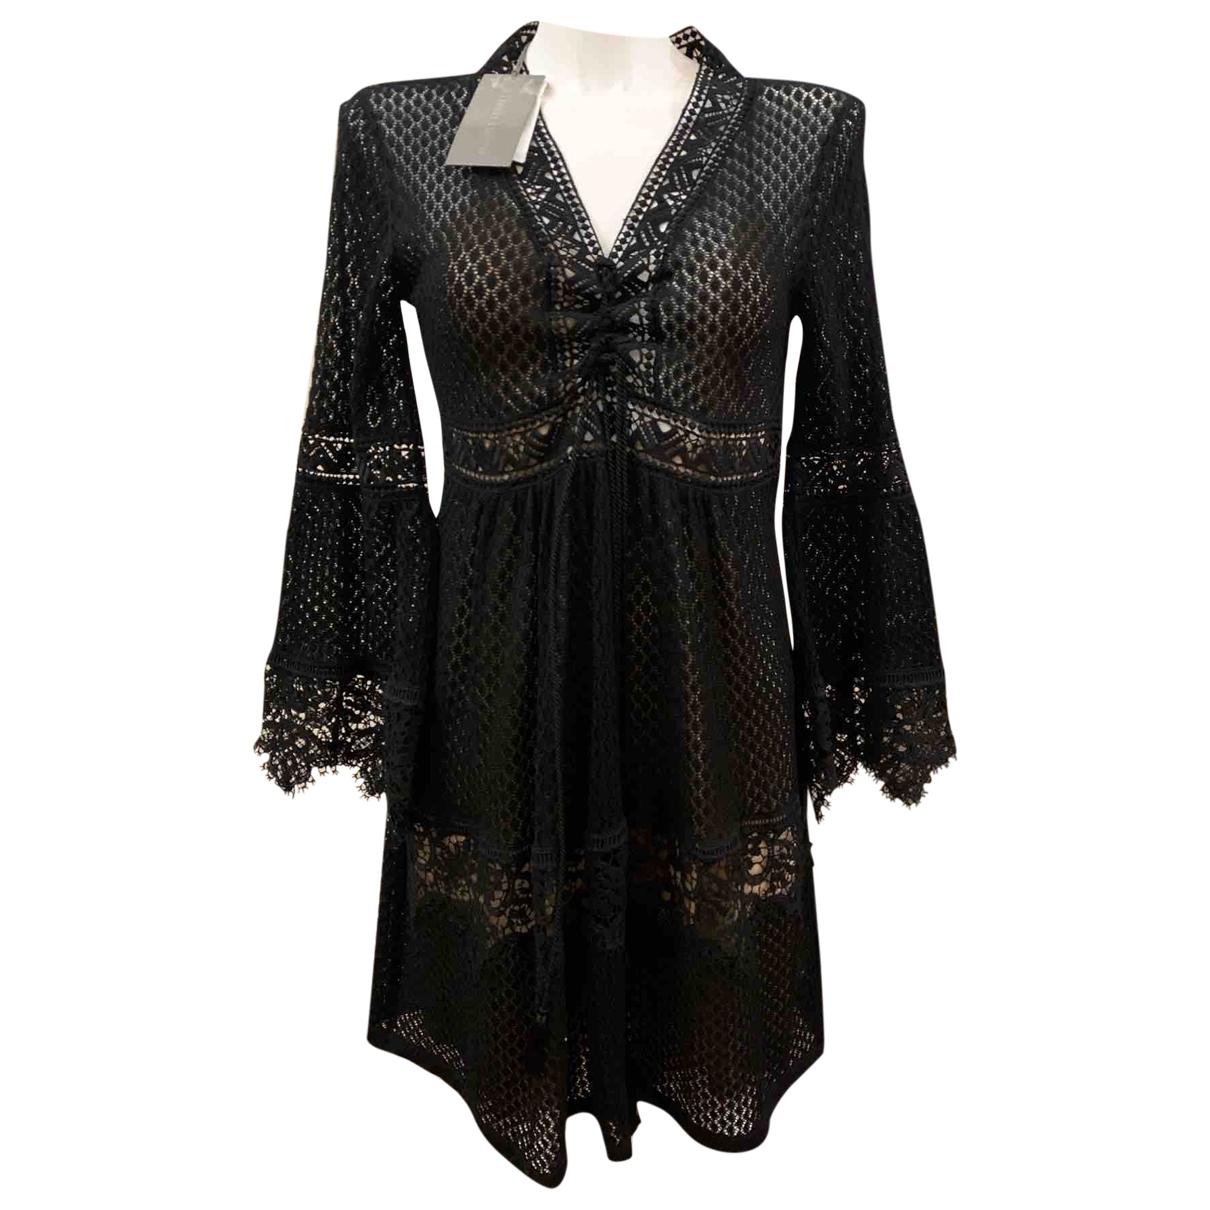 Alberta Ferretti \N Kleid in  Schwarz Baumwolle